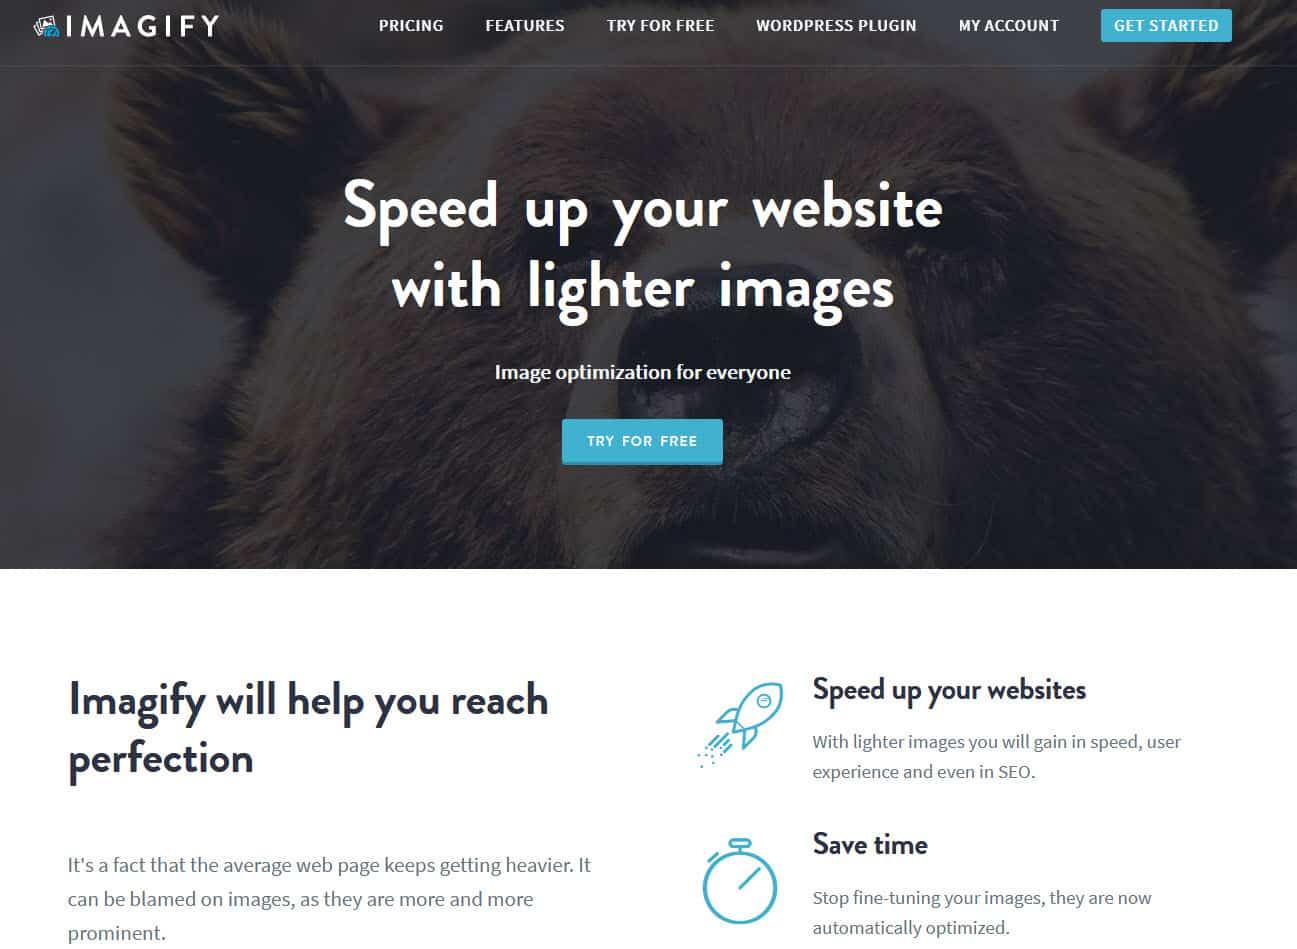 The Imagify plugin's homepage screenshot